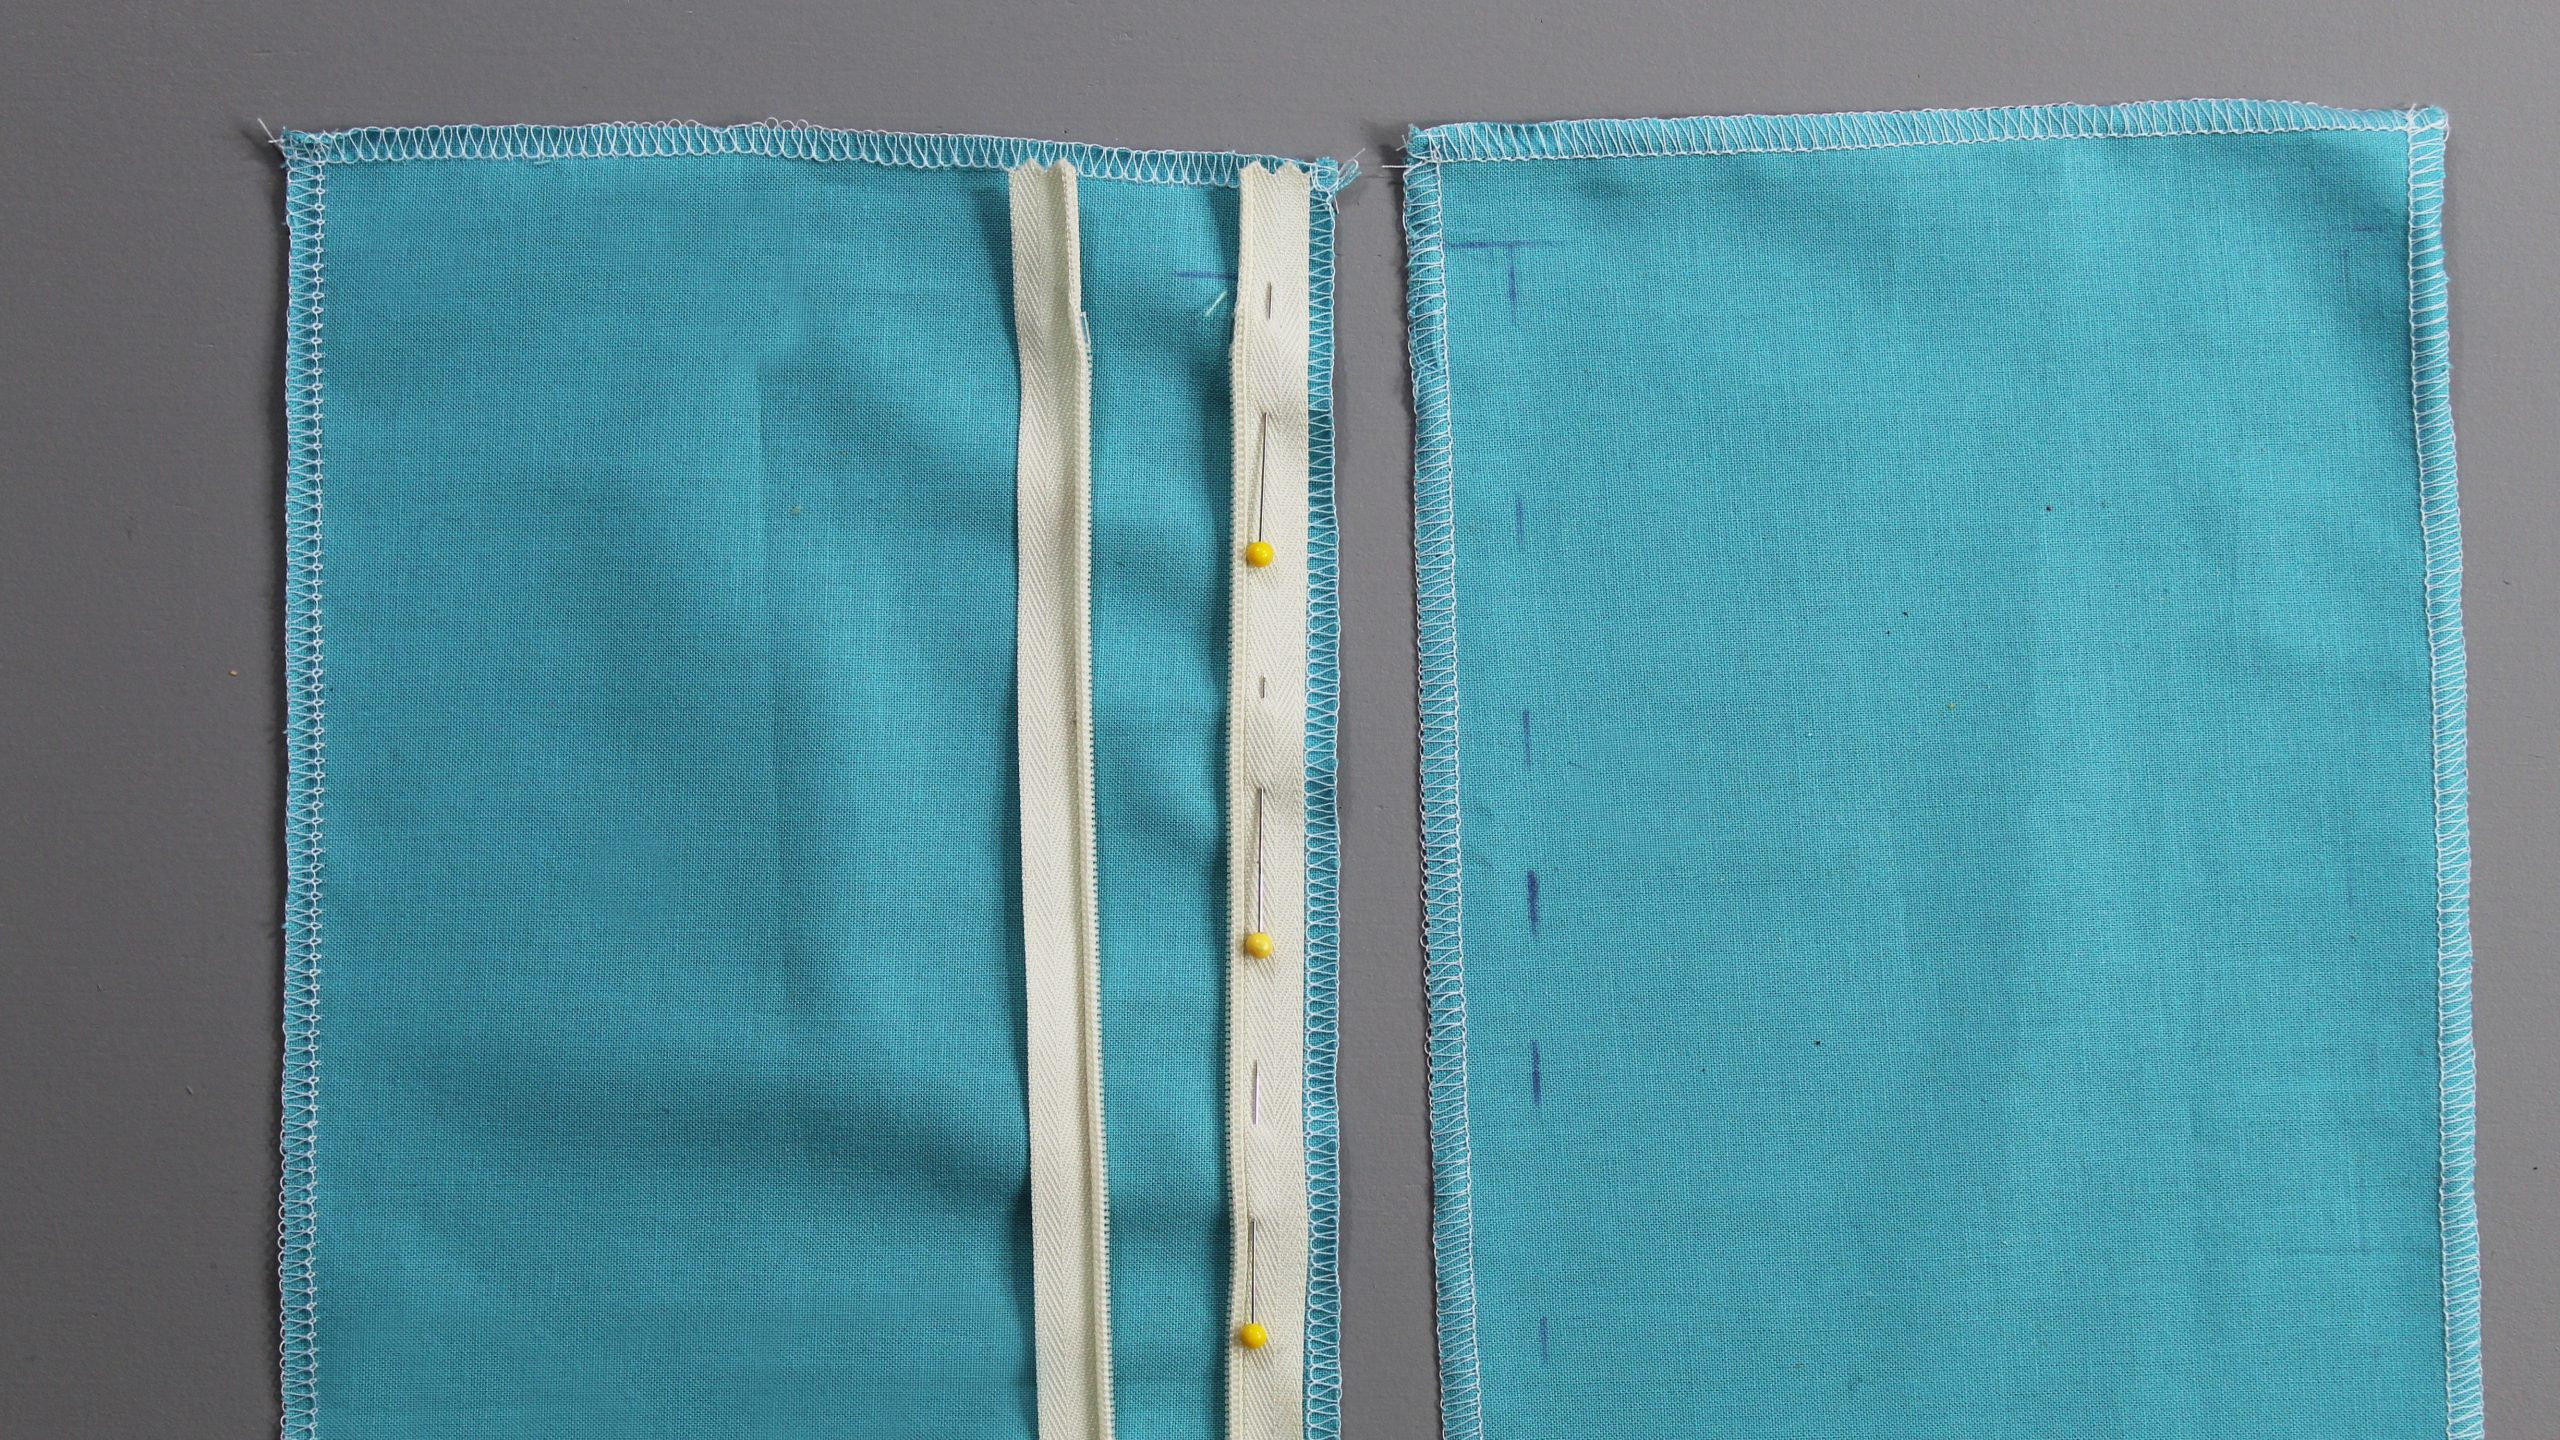 Zipper pinned to fabric